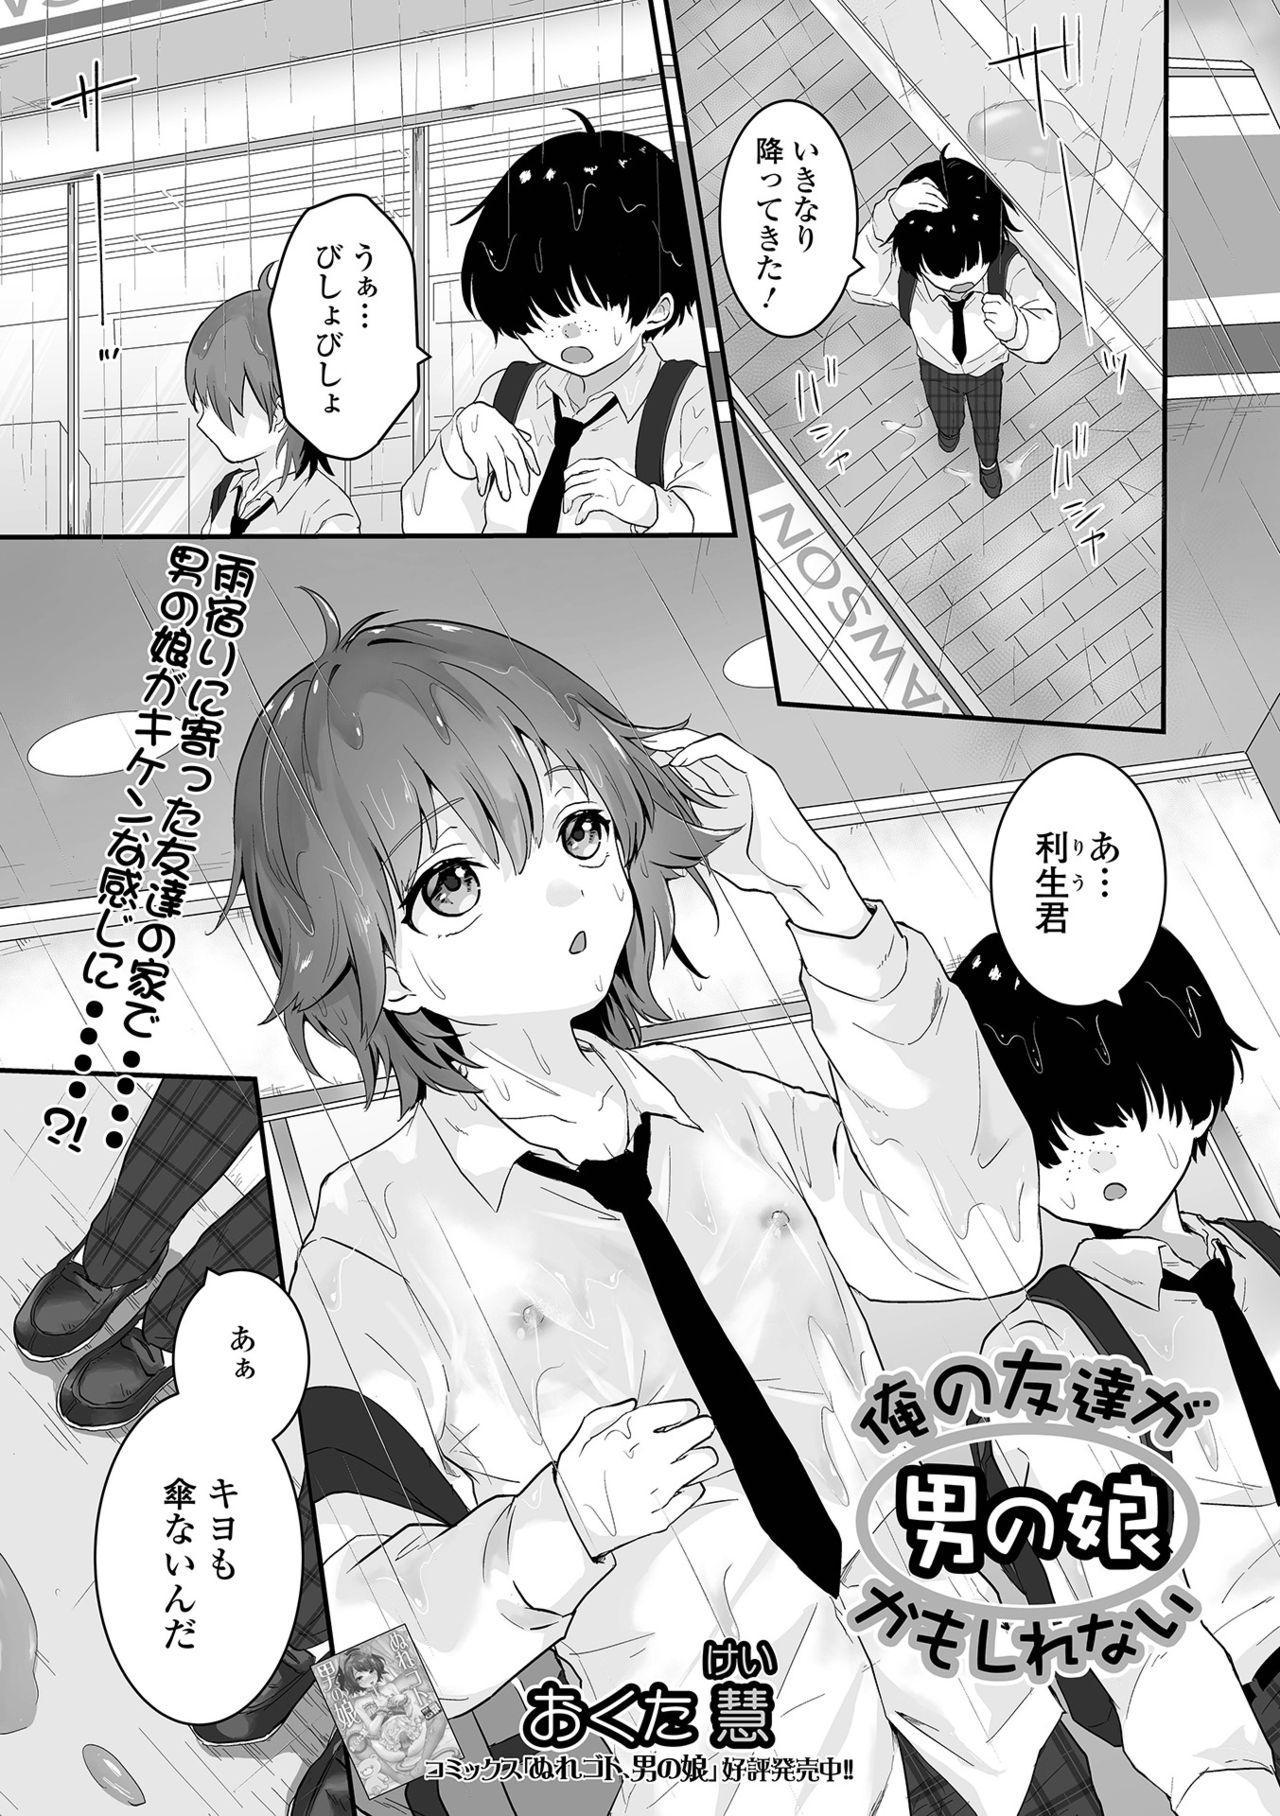 Gekkan Web Otoko no Ko-llection! S Vol. 64 34